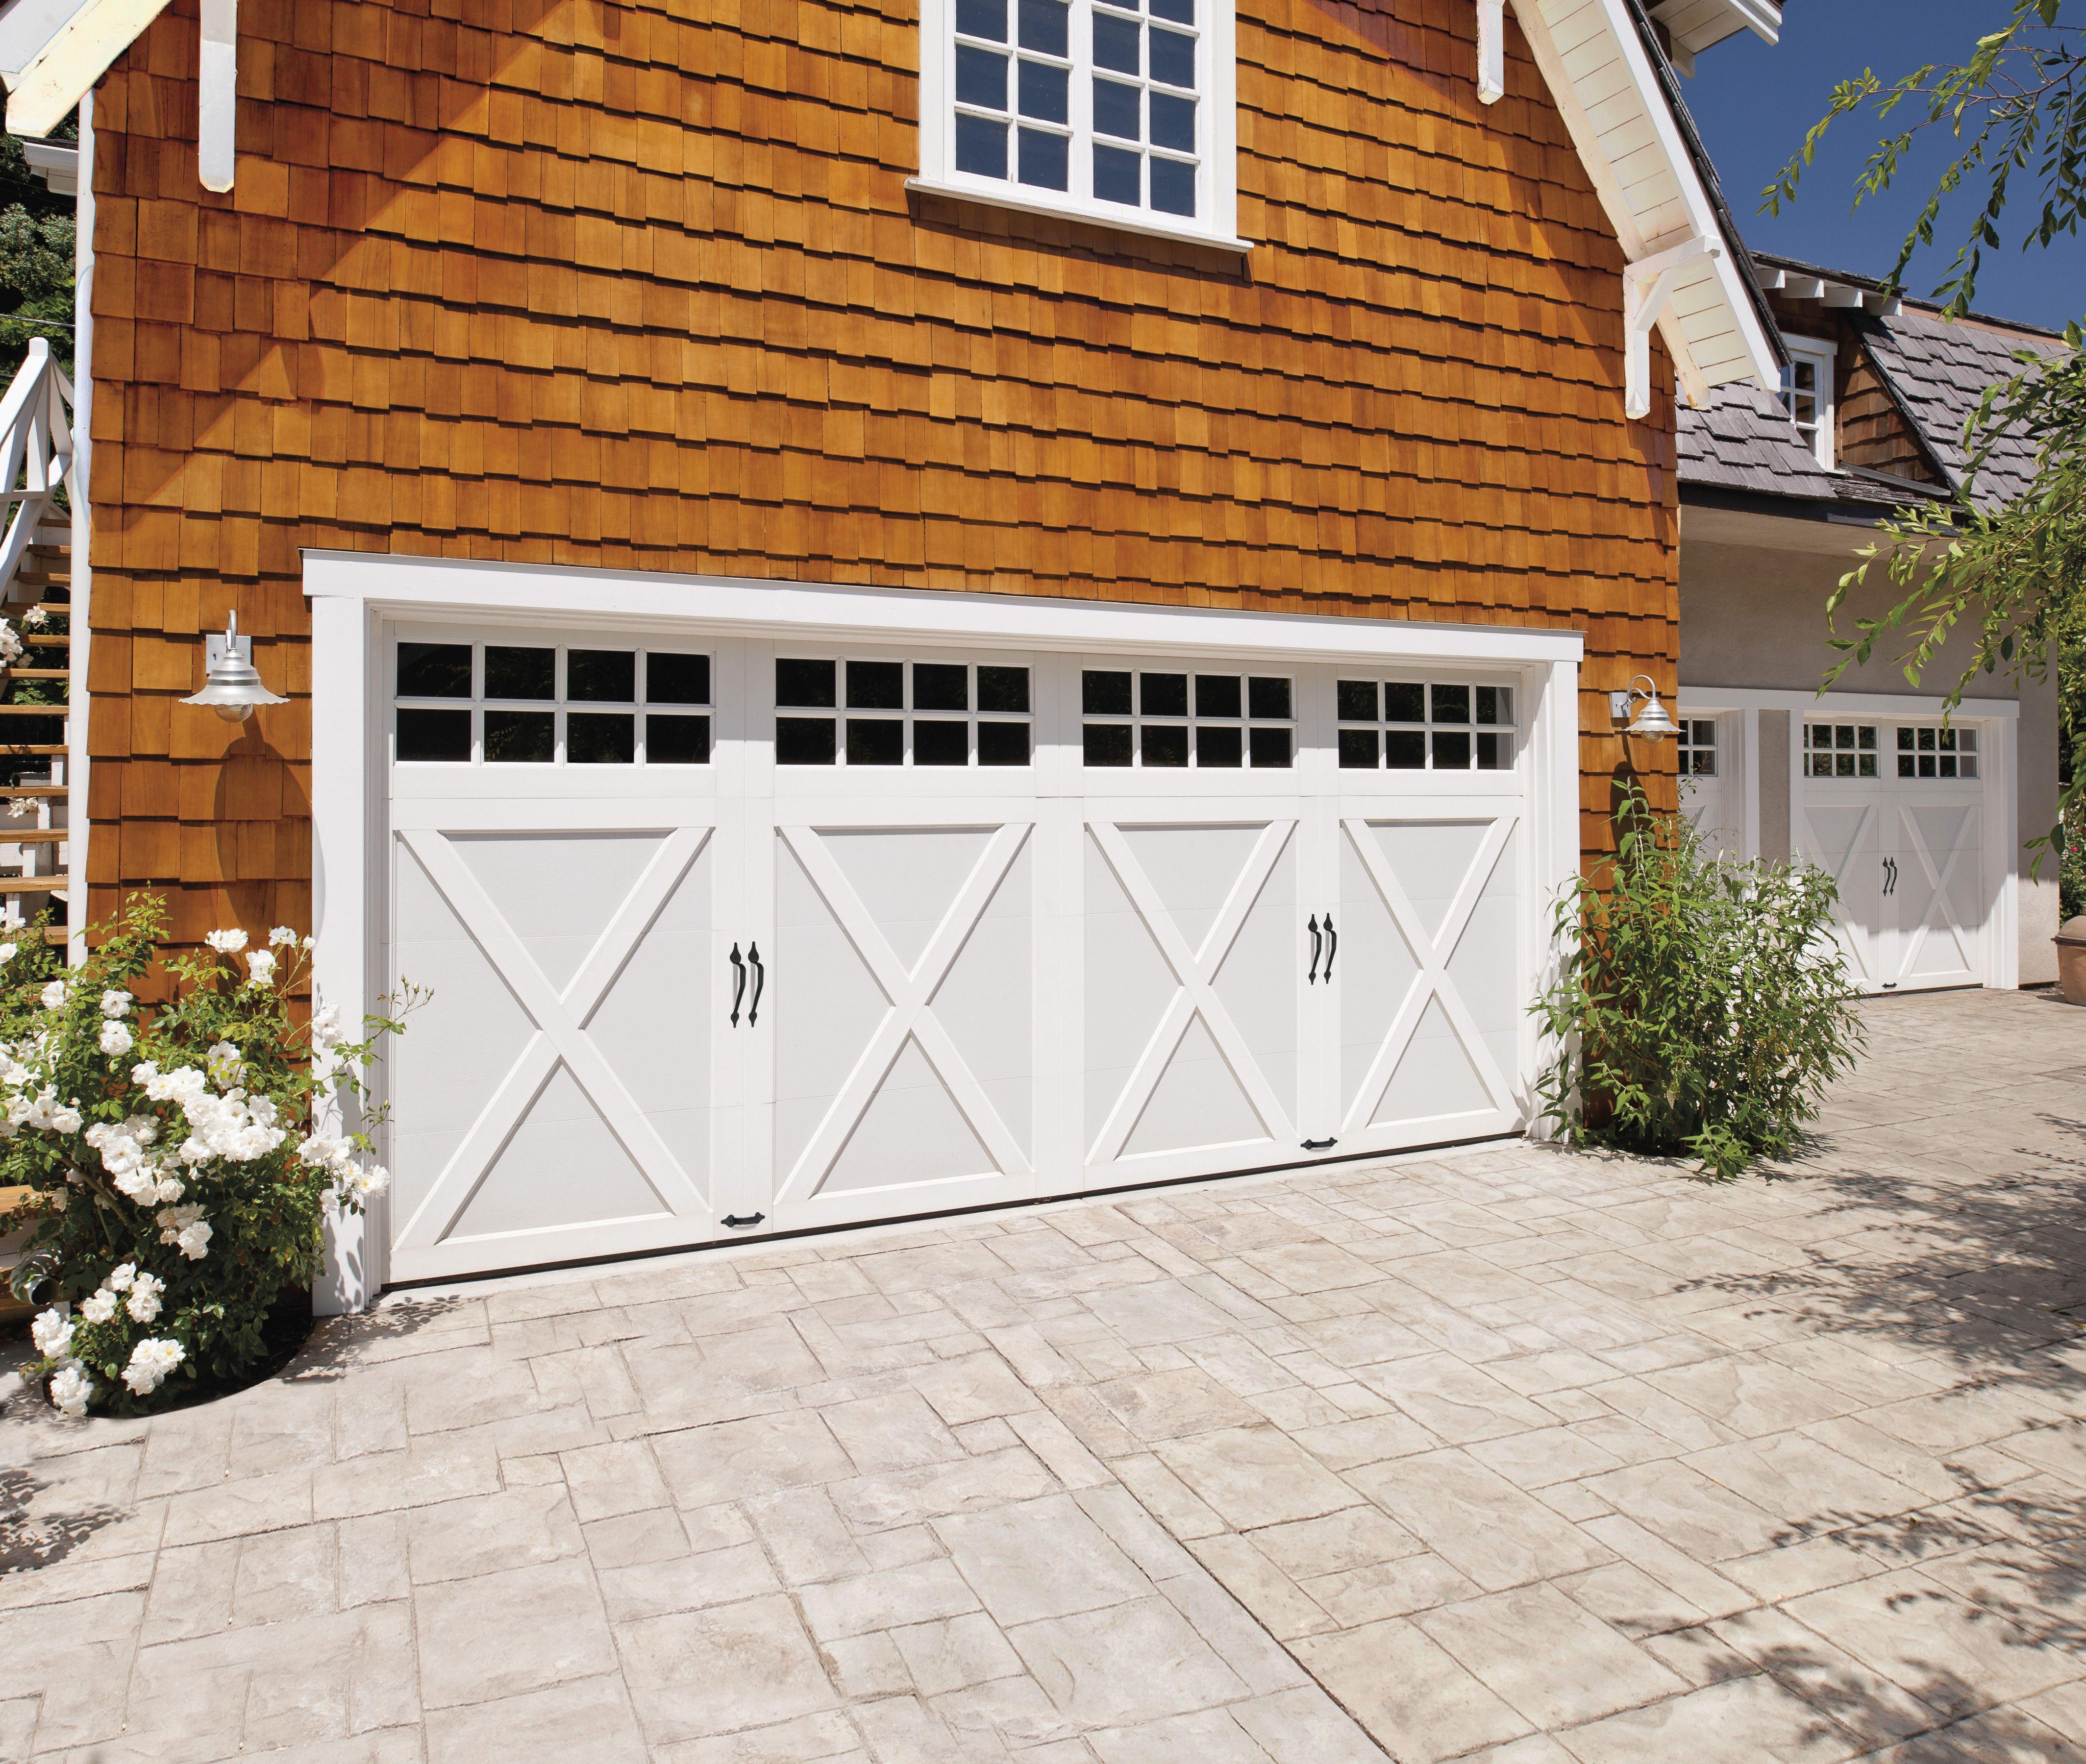 Coachman Garage Doors Carriage Style Garage Doors Garage Door Styles Carriage House Garage Doors